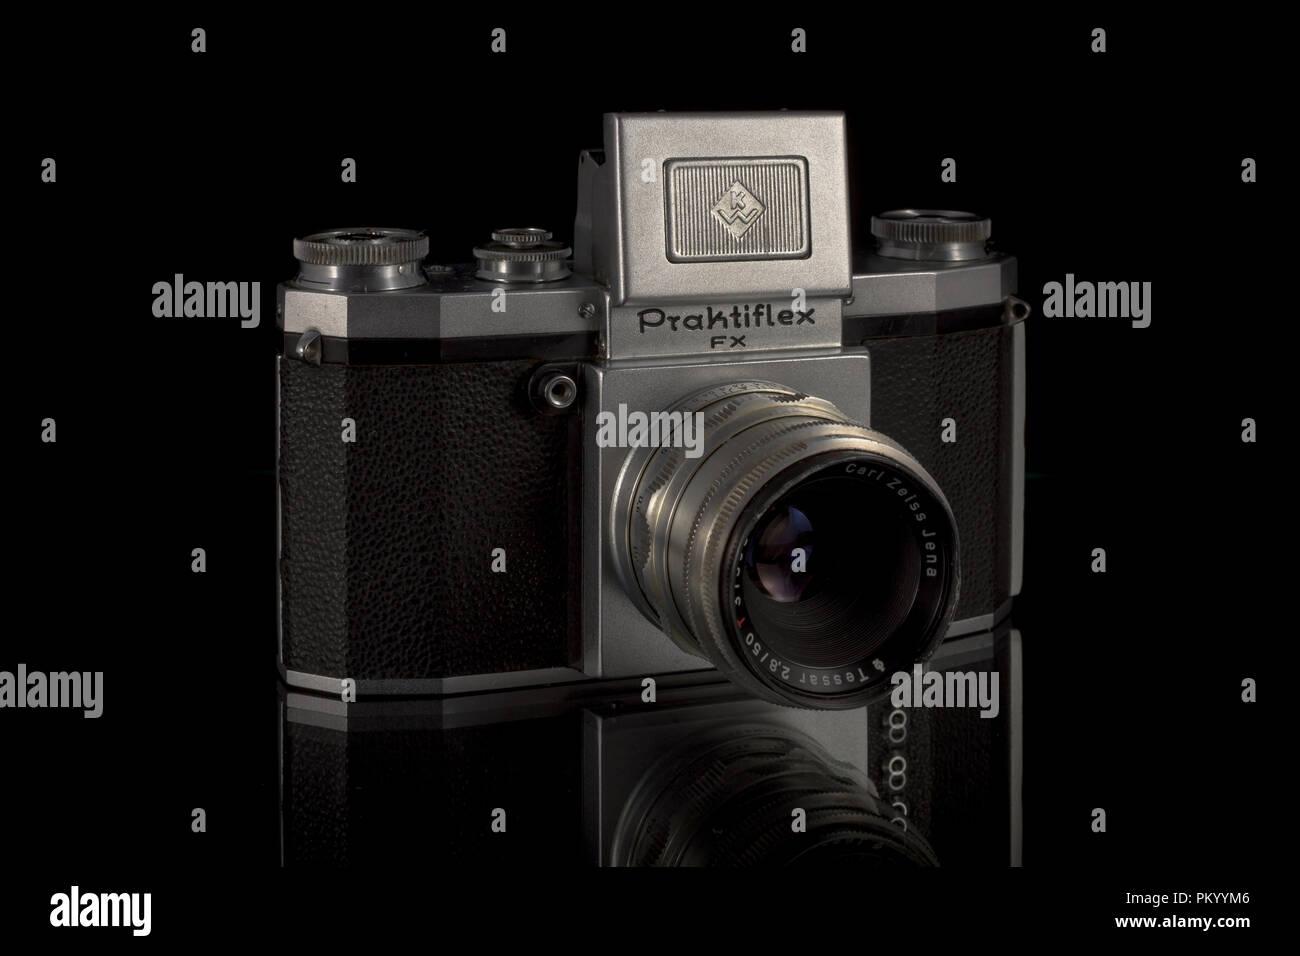 The Praktiflex is a 35mm SLR film camera, manufactured by Kamera-Werkstätten VEB Niedersedlitz,Dresden, former East Germany and produced between 39-49 - Stock Image